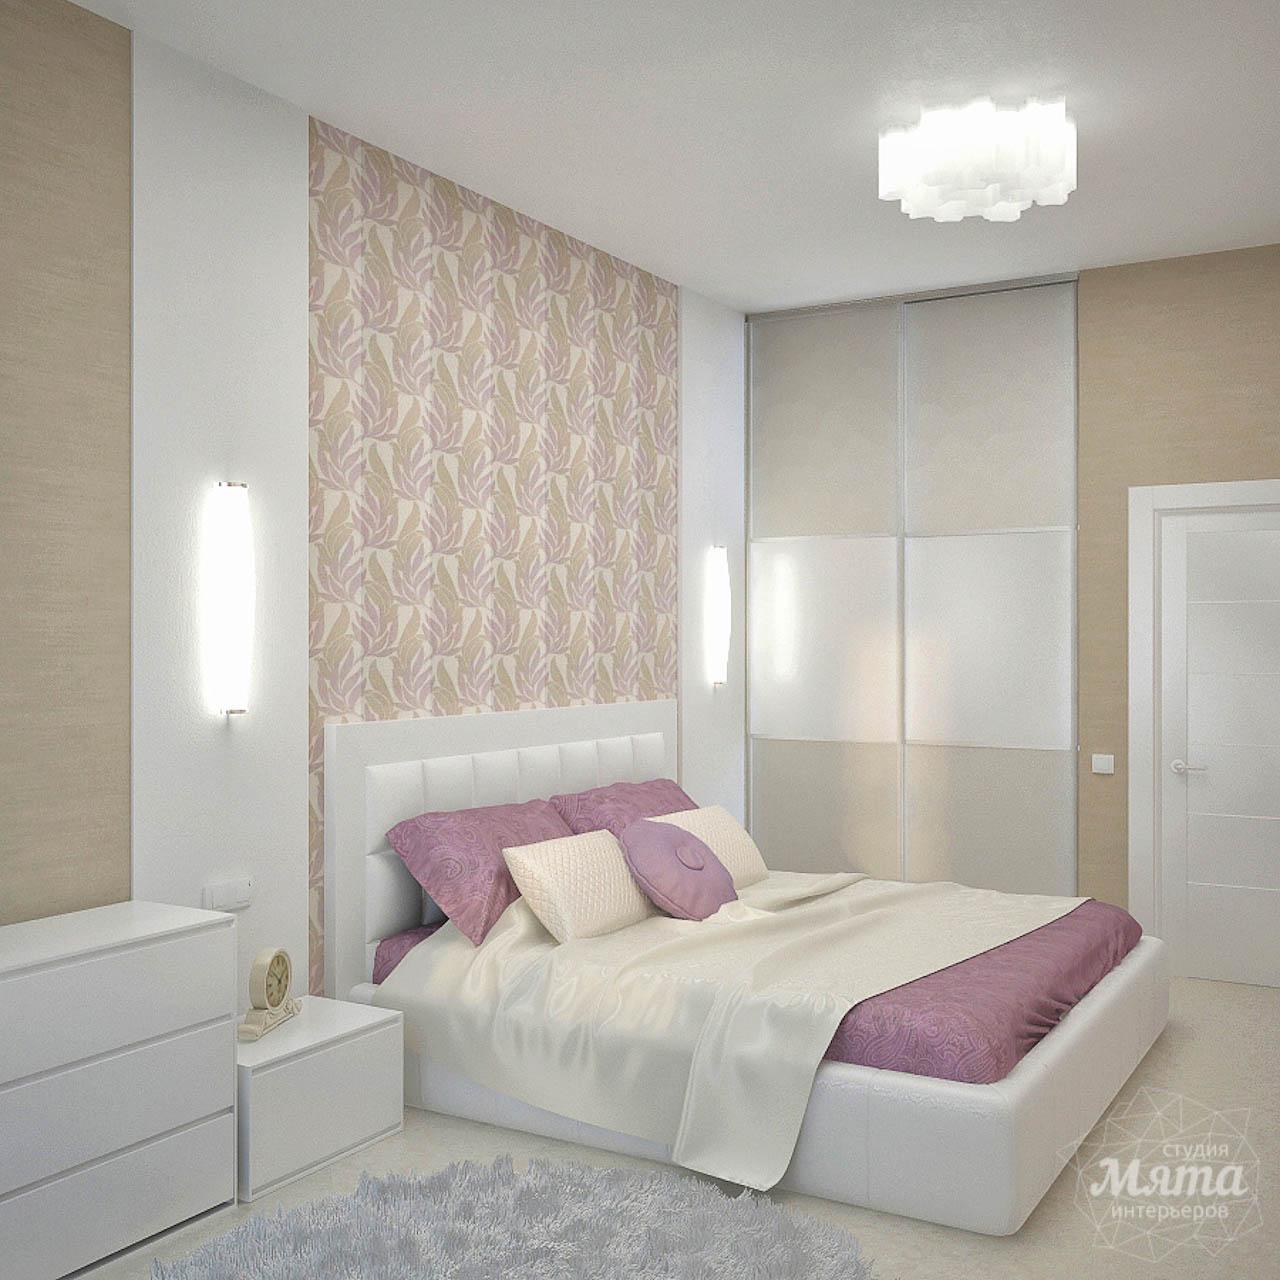 Дизайн интерьера и ремонт трехкомнатной квартиры по ул. Чкалова 124 img261307400